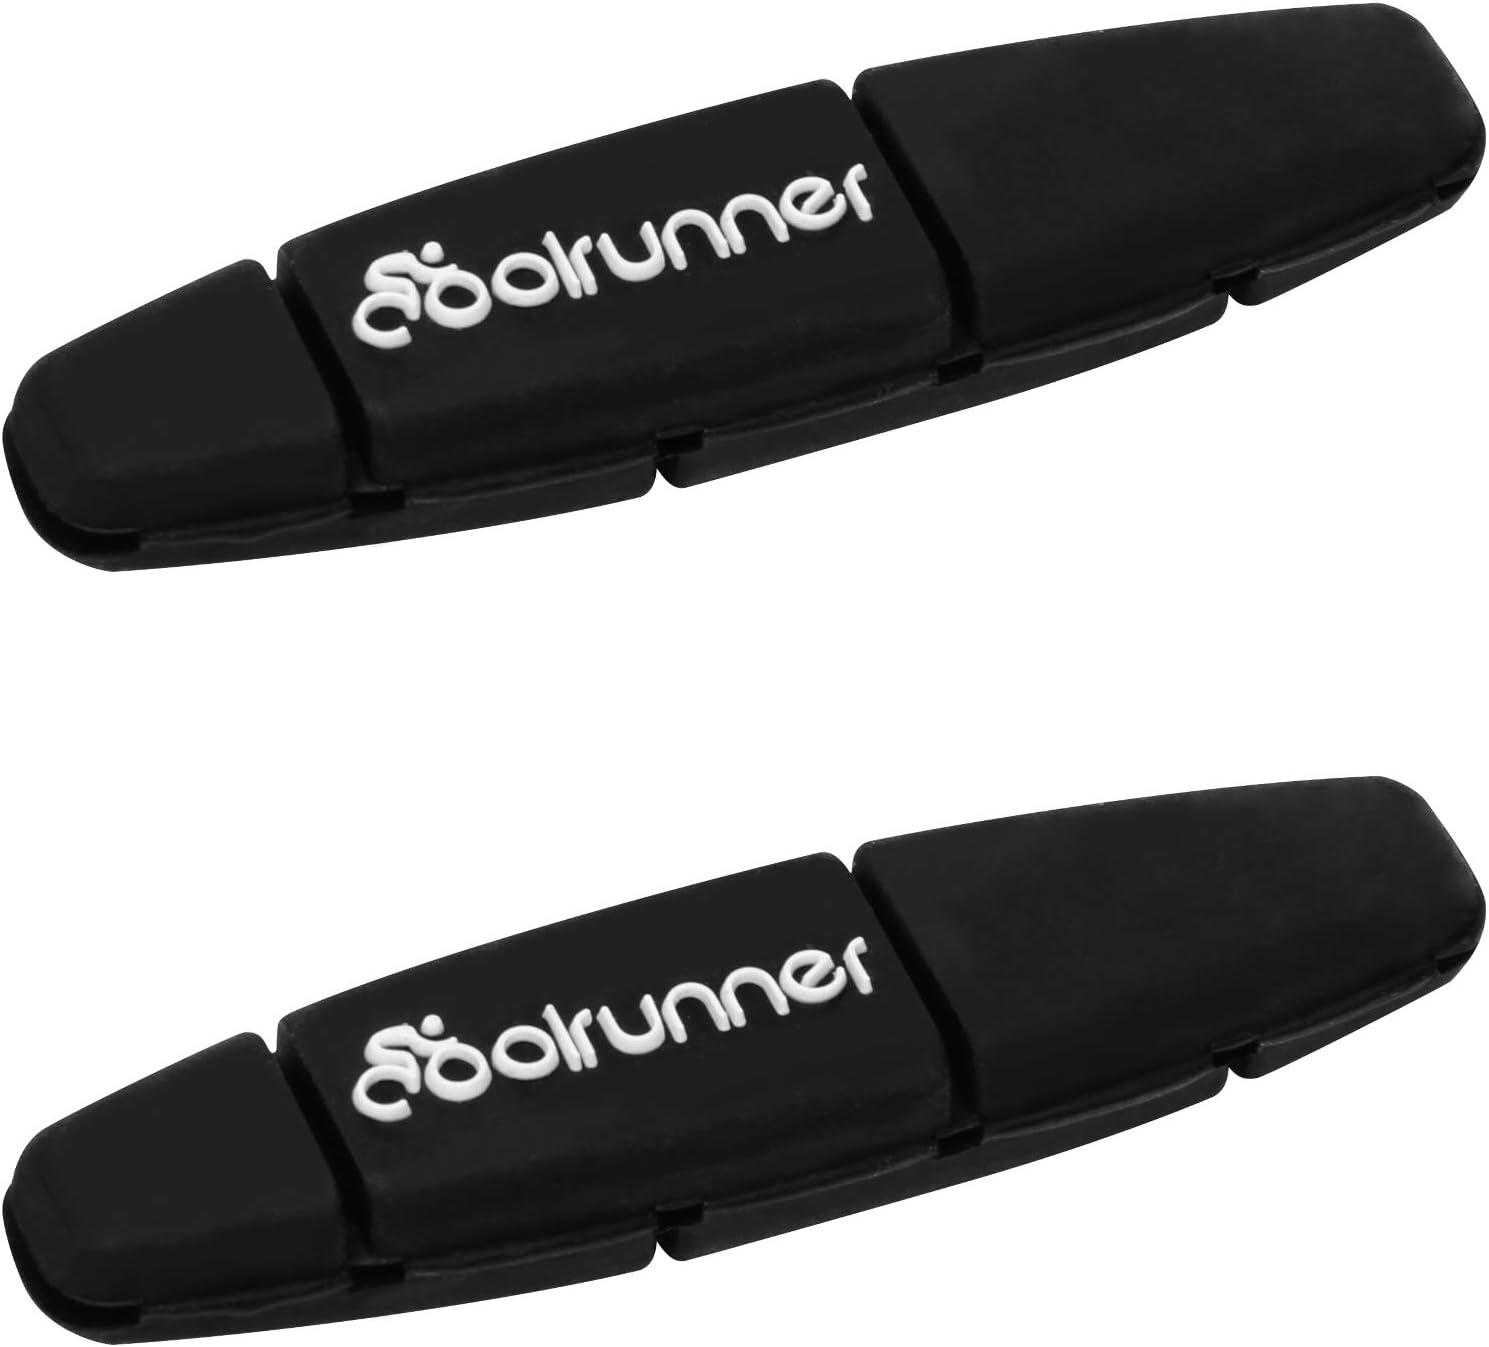 Coolrunner Tennis Dampener, 2 pcs Tennis Vibration Dampeners Black Tennis Racket Dampeners, Tennis String Shock Absorbers Soft and Durable